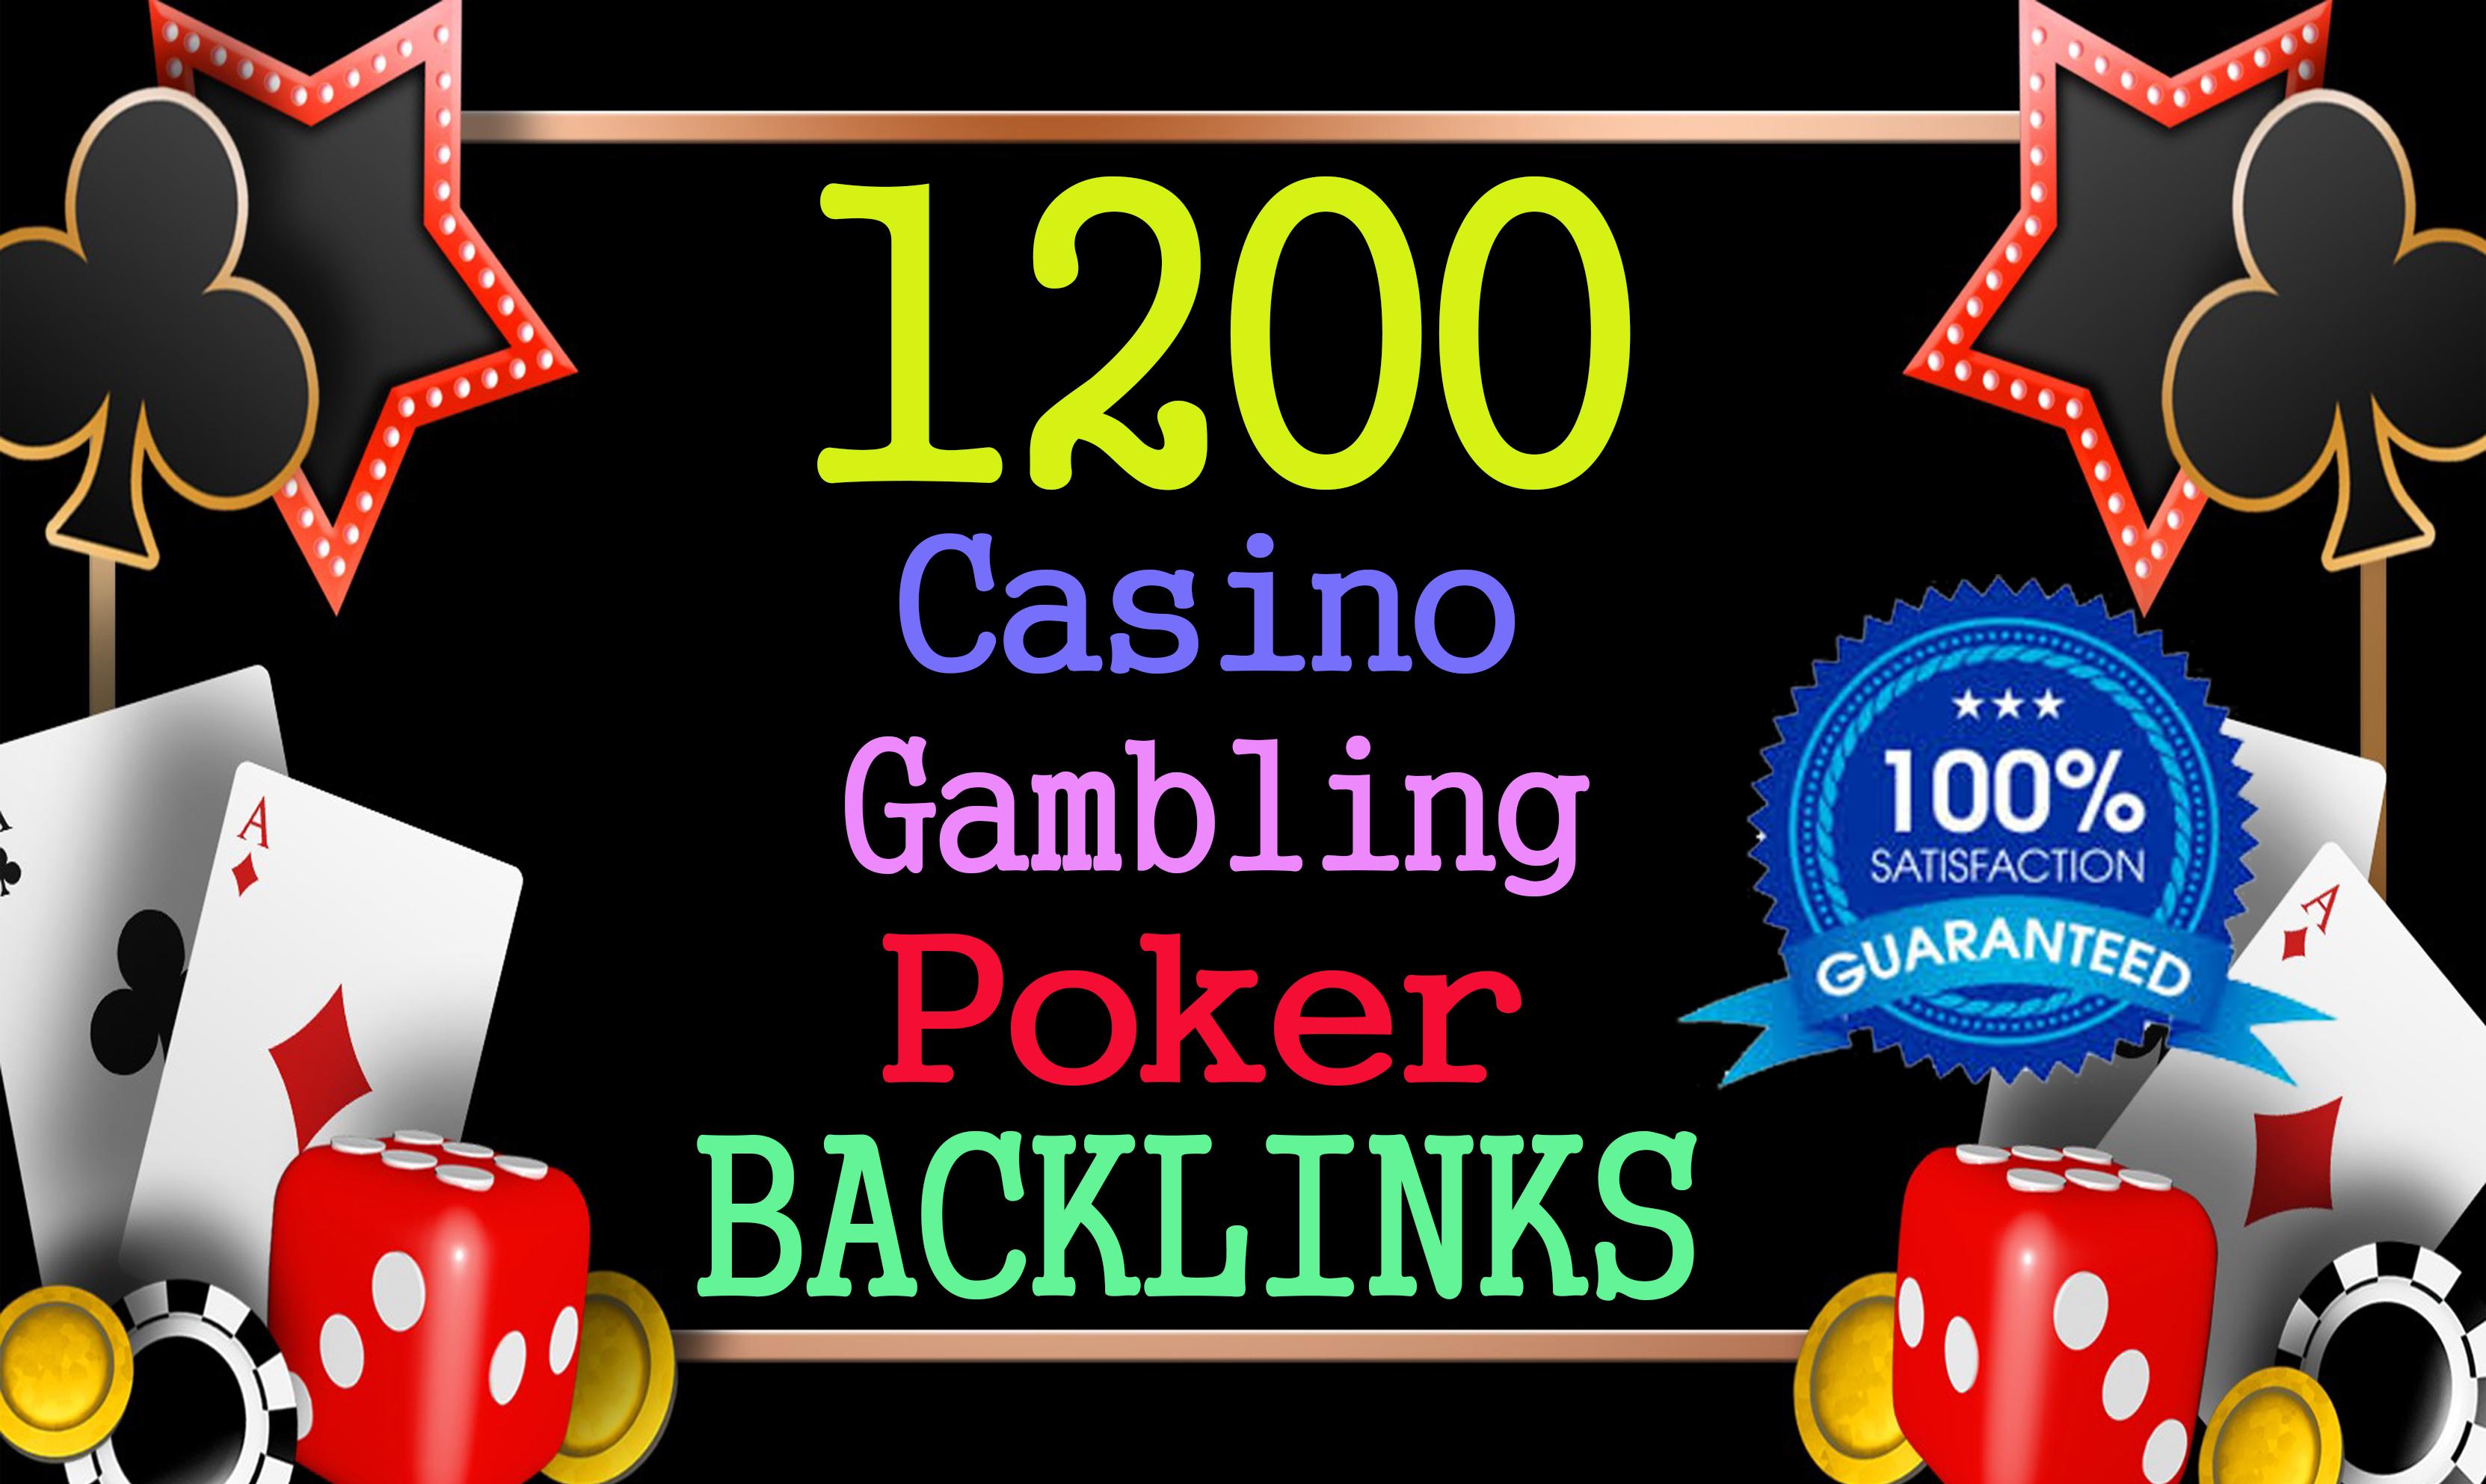 Permanent 1200 powerful judi bola,  Casino,  Gambling,  Poker,  Sports High Quality Web2.0 Backlinks